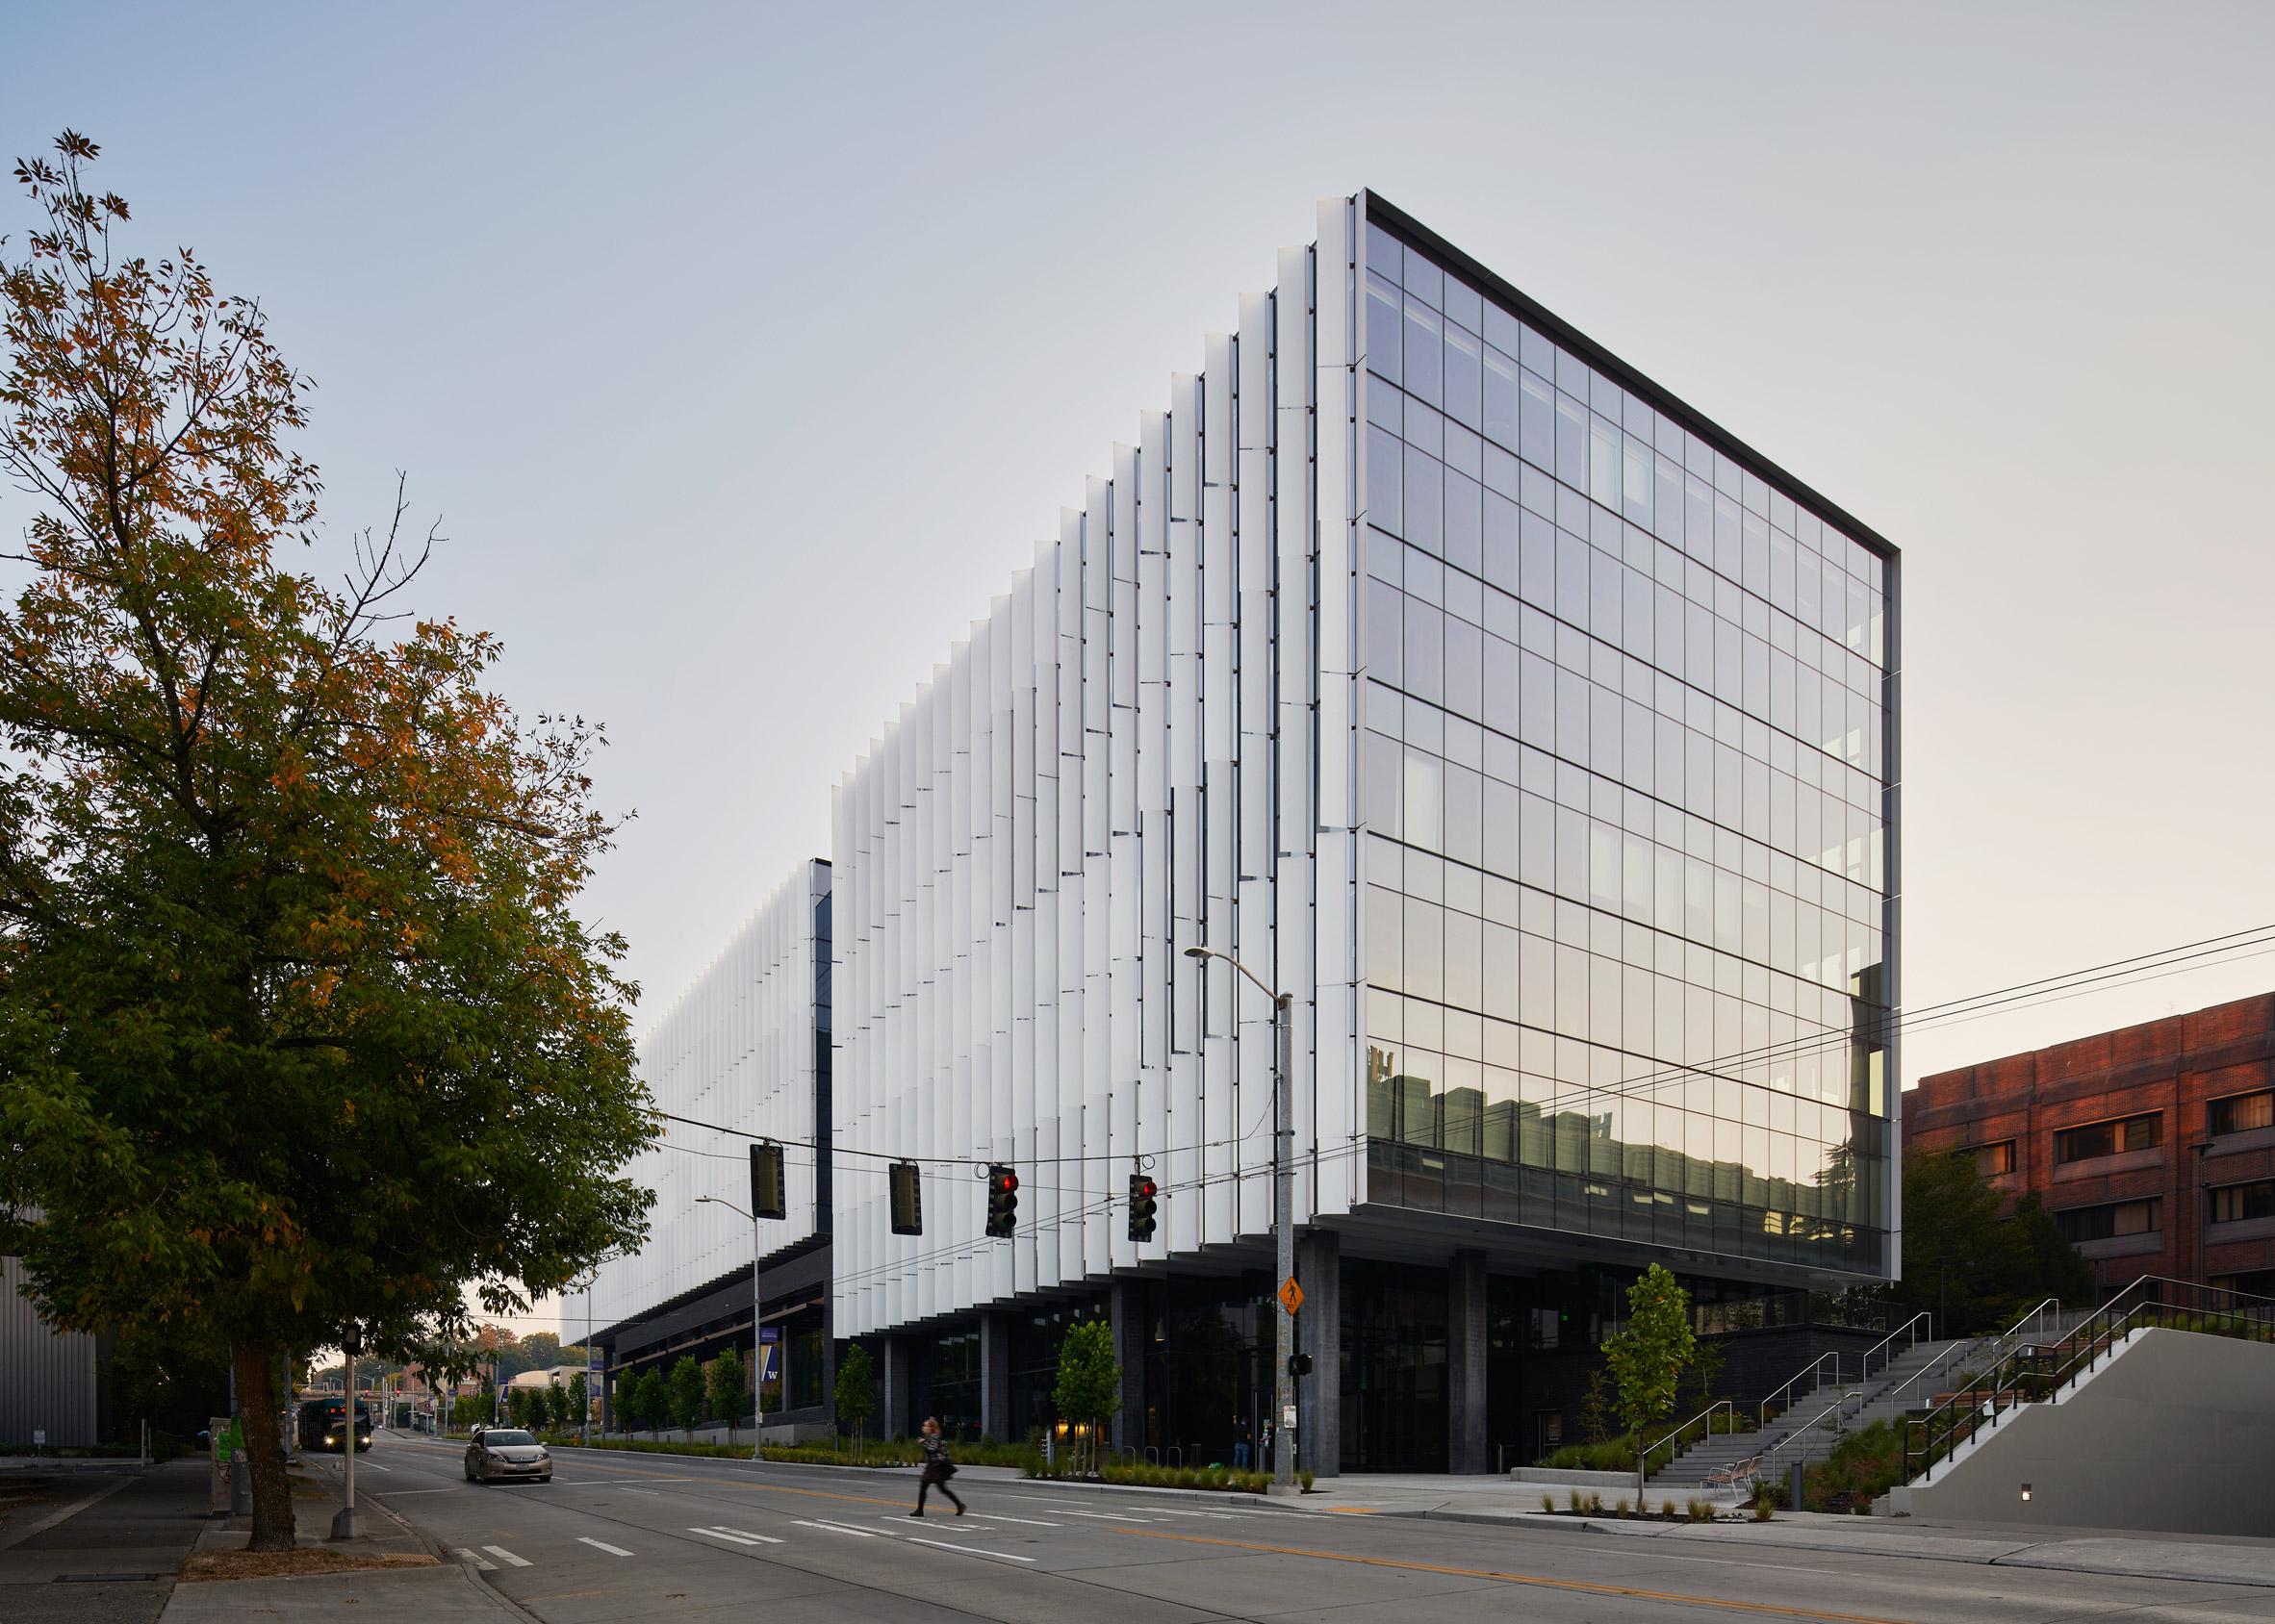 The Rosling Center has a glass facade